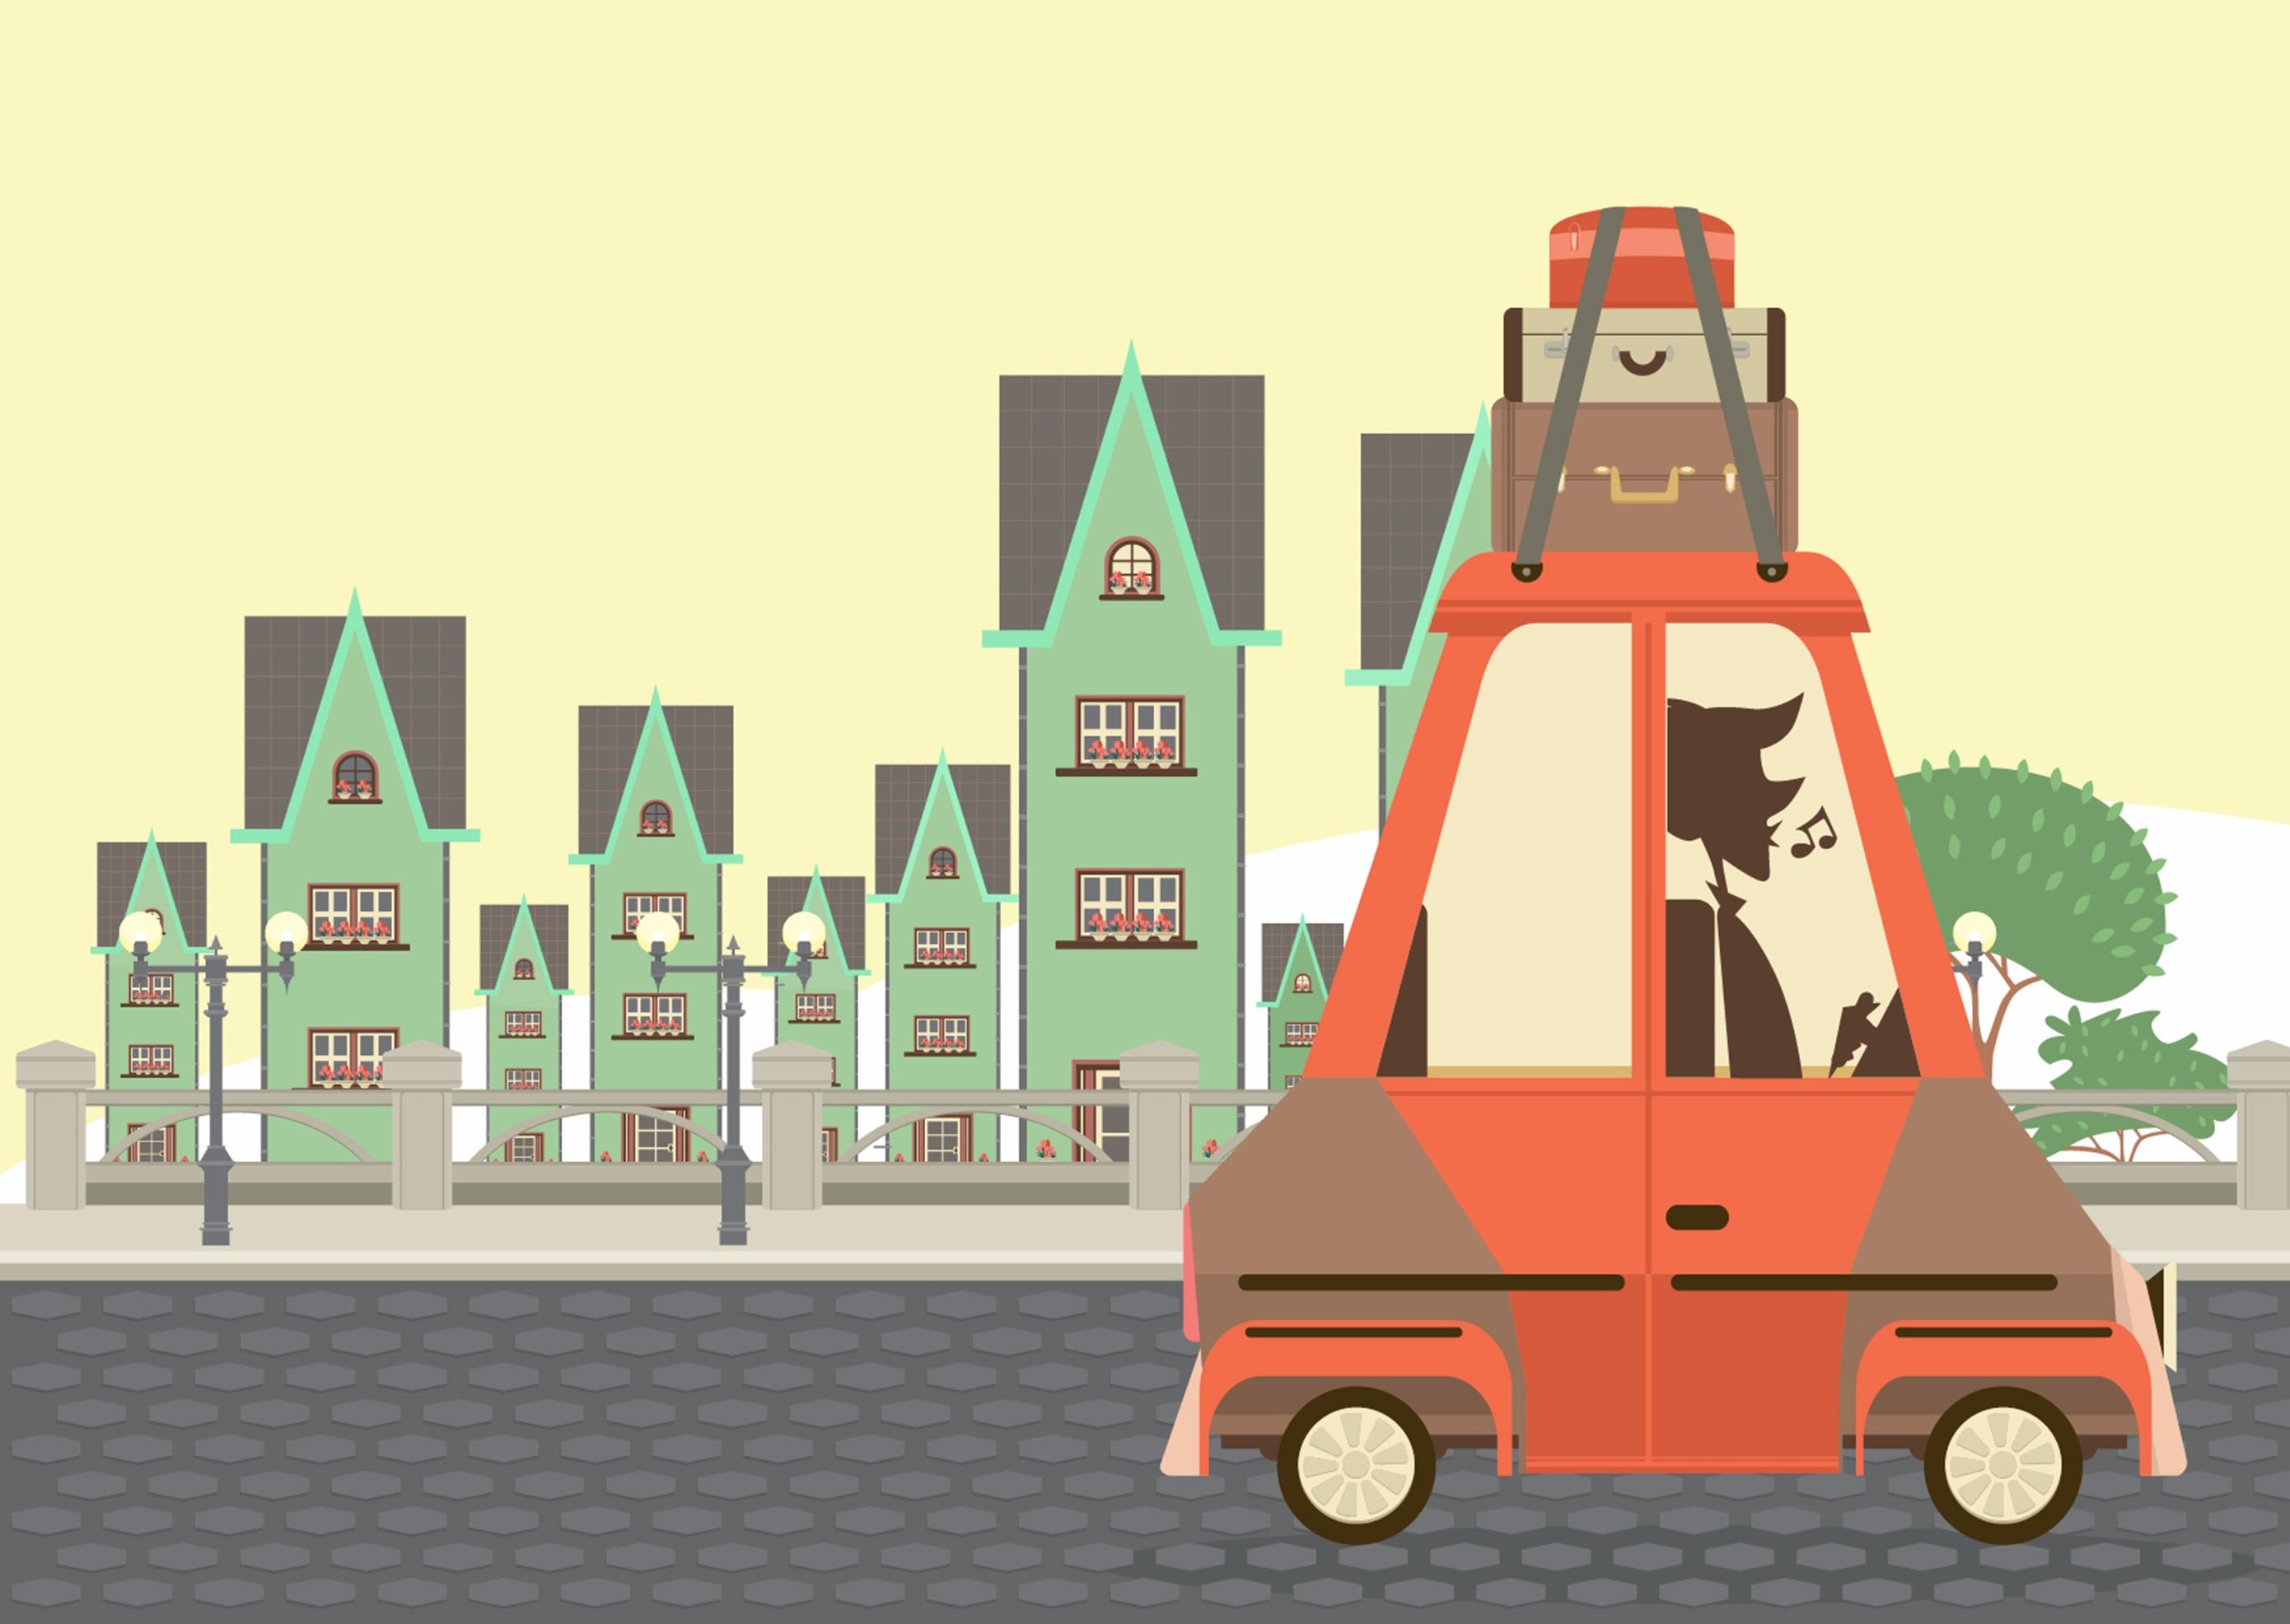 Gambar Mobil Kota Mainan Ilustrasi Gambar Kartun Screenshot